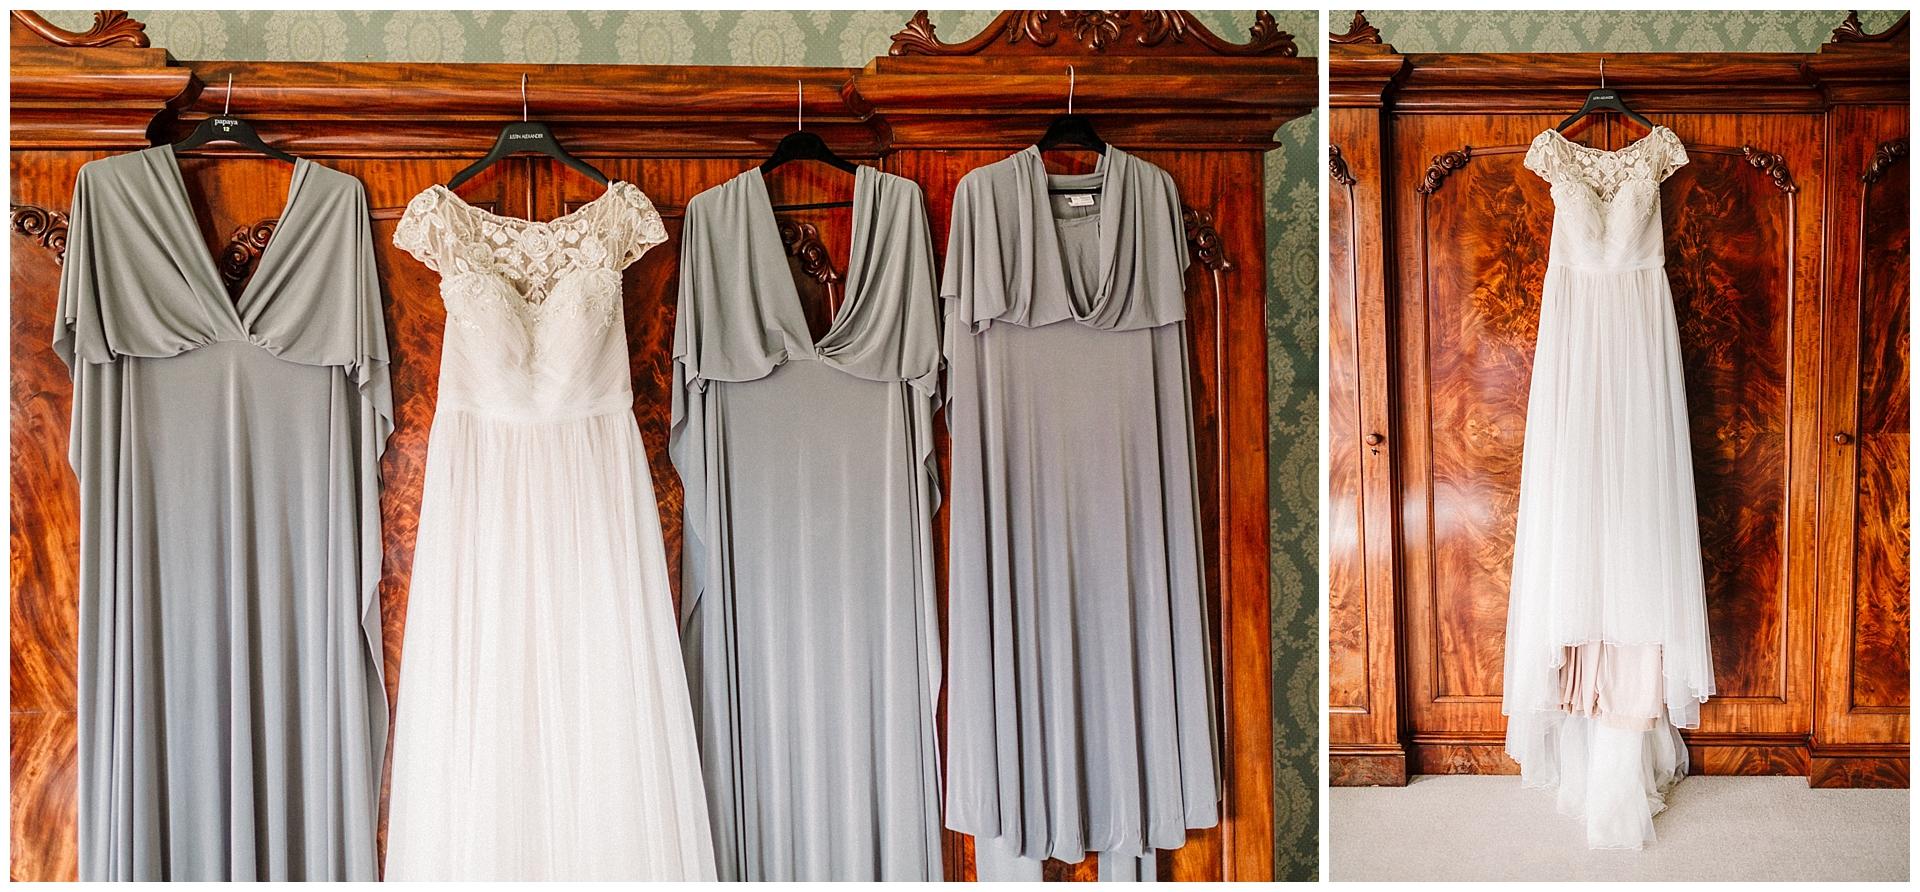 A wedding dress and three bridesmaid dresses hanging on a wardrobe